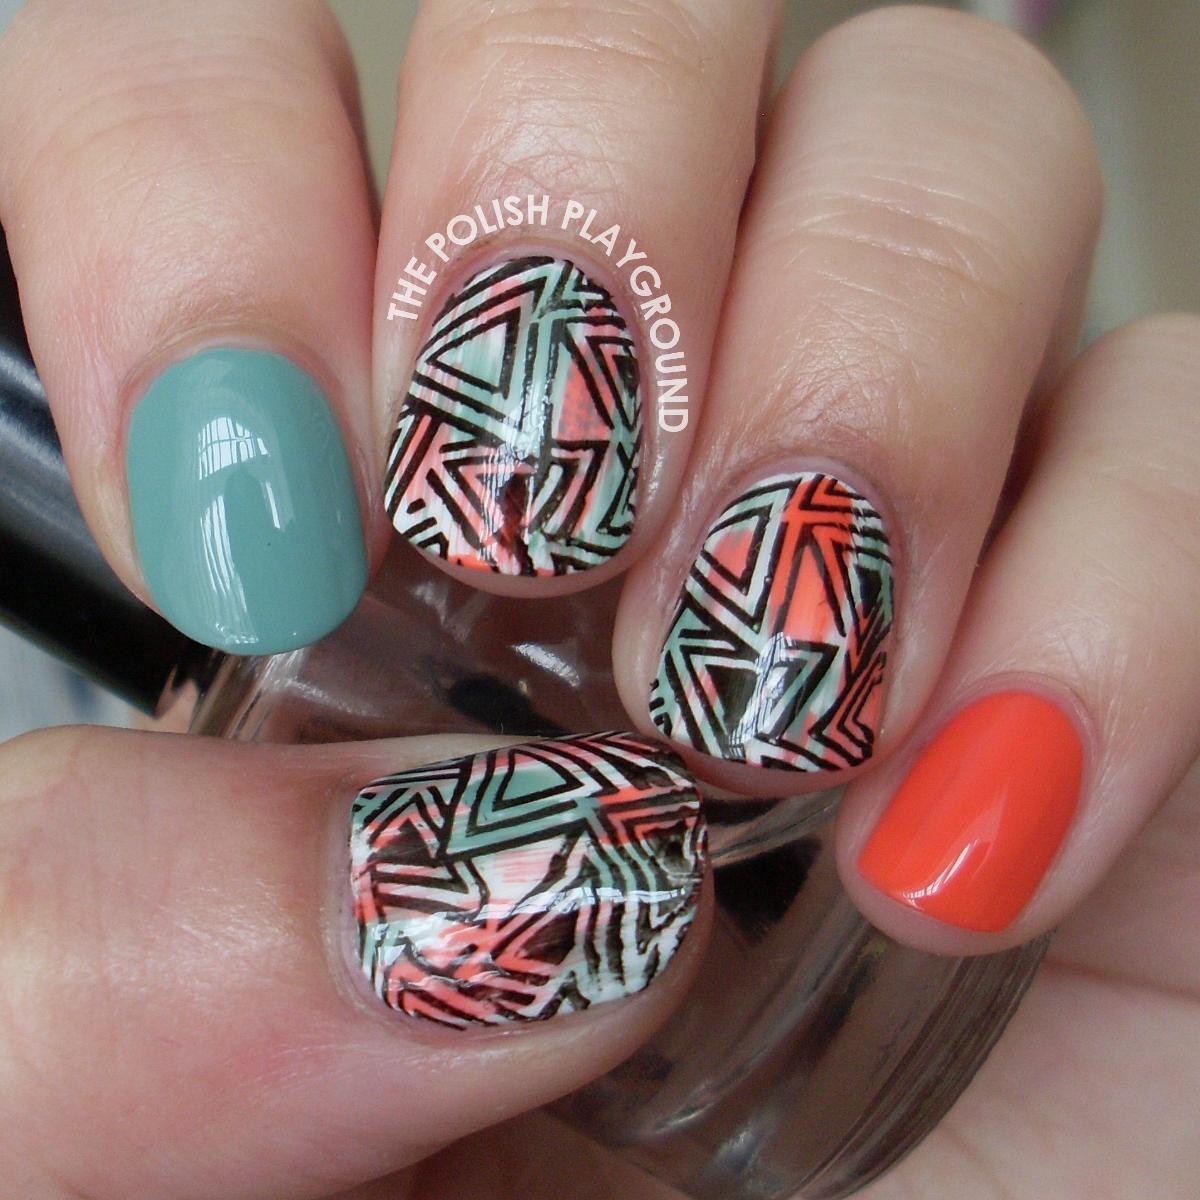 Distressed Geometric Stamping Nail Art